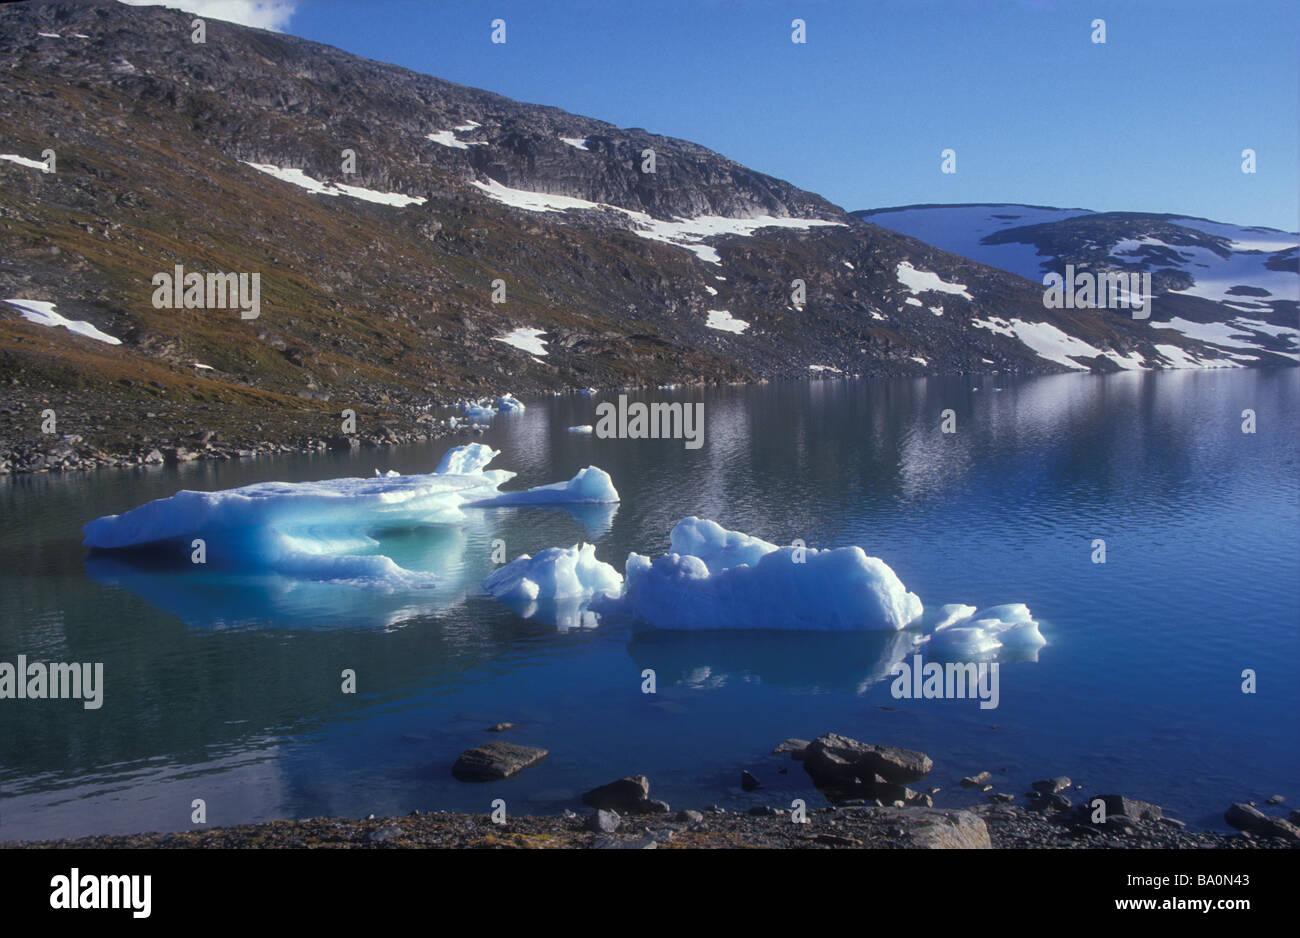 Melting ice floe in blue Mountain lake Lapland Sweden - Stock Image